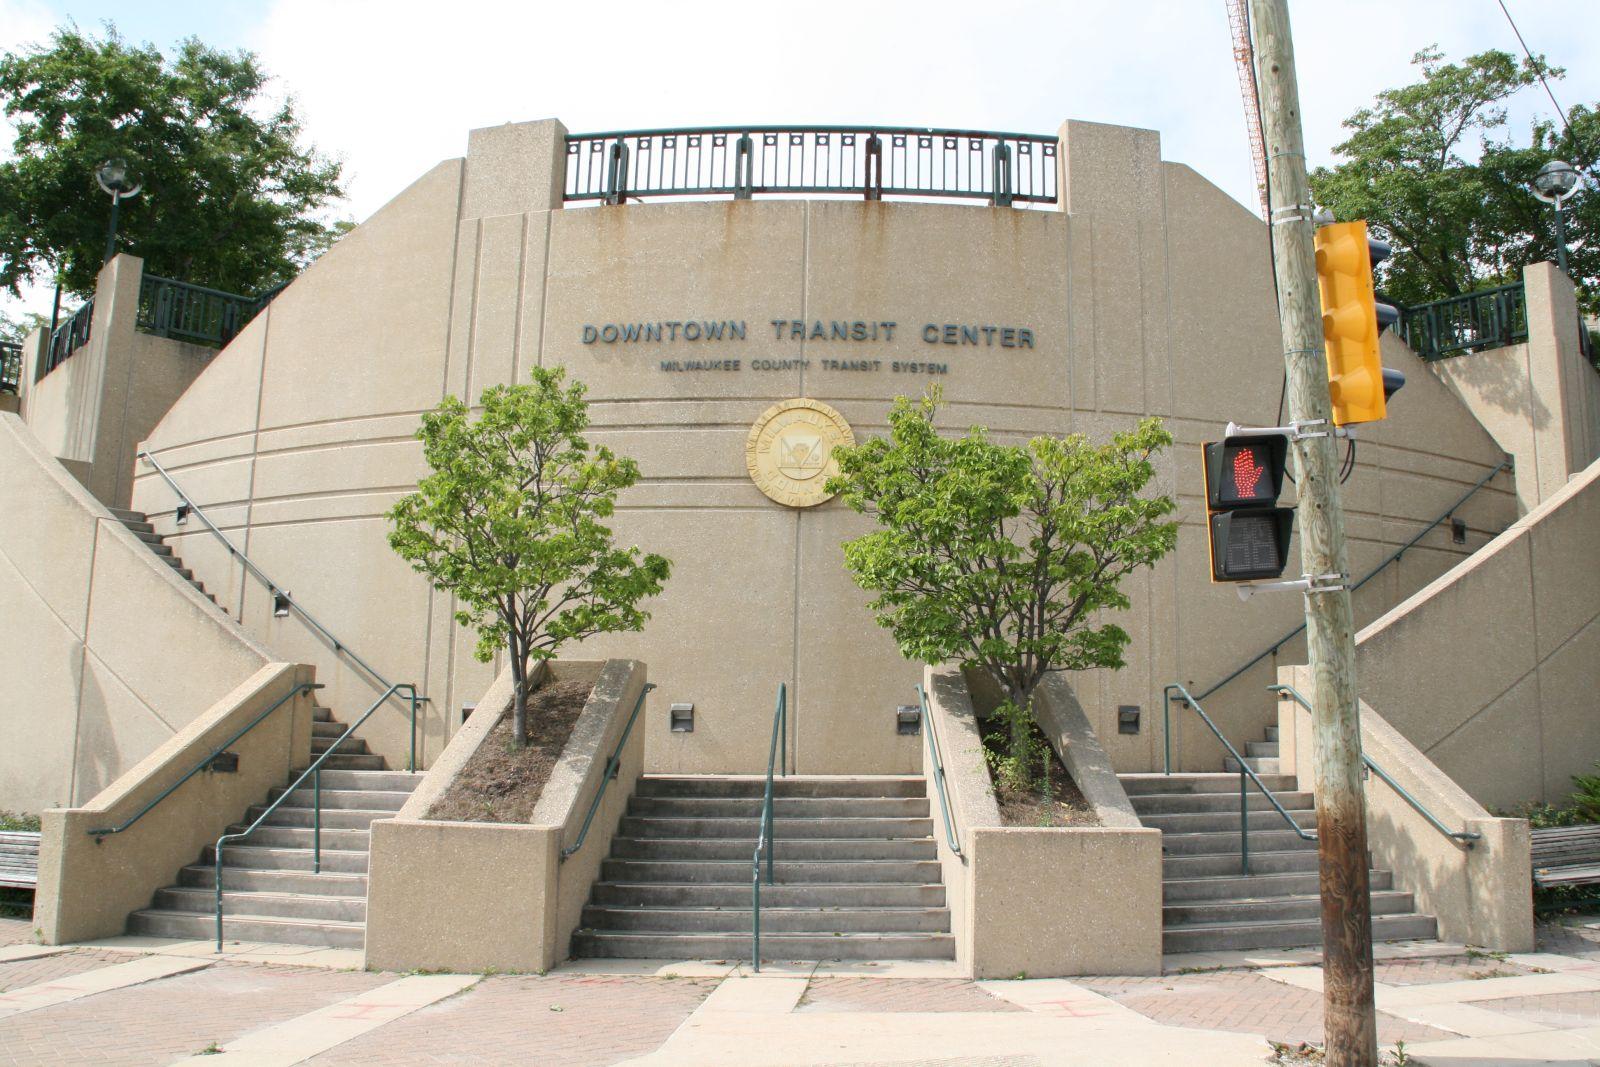 Downtown Transit Center